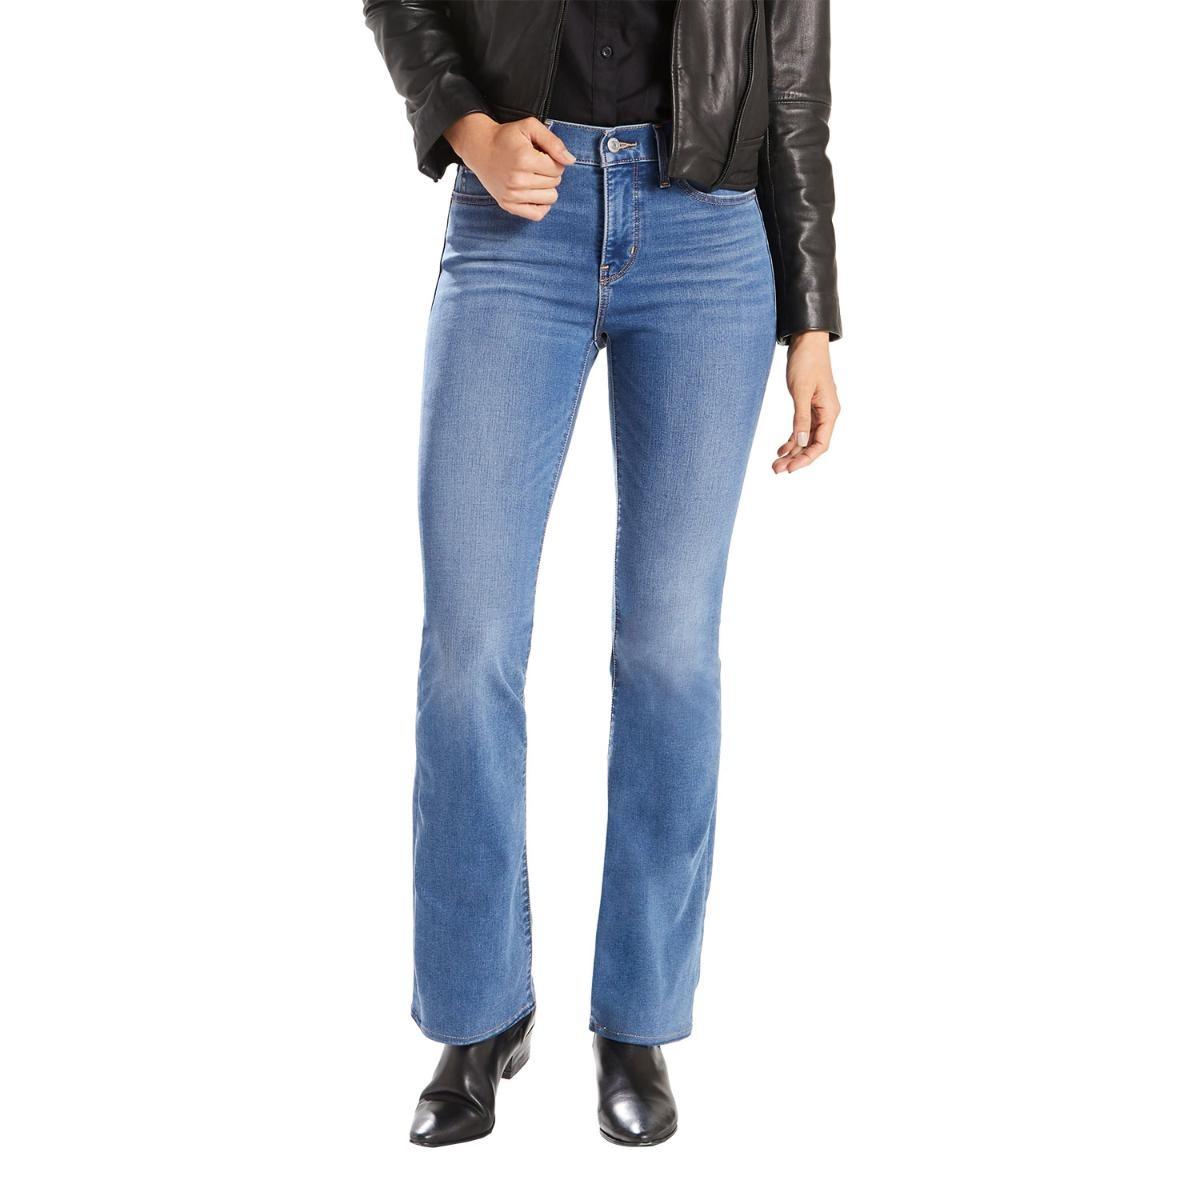 calça jeans levis feminina 315 shaping bootcut 4 way stretch. Carregando  zoom. 6a9fa31dfee